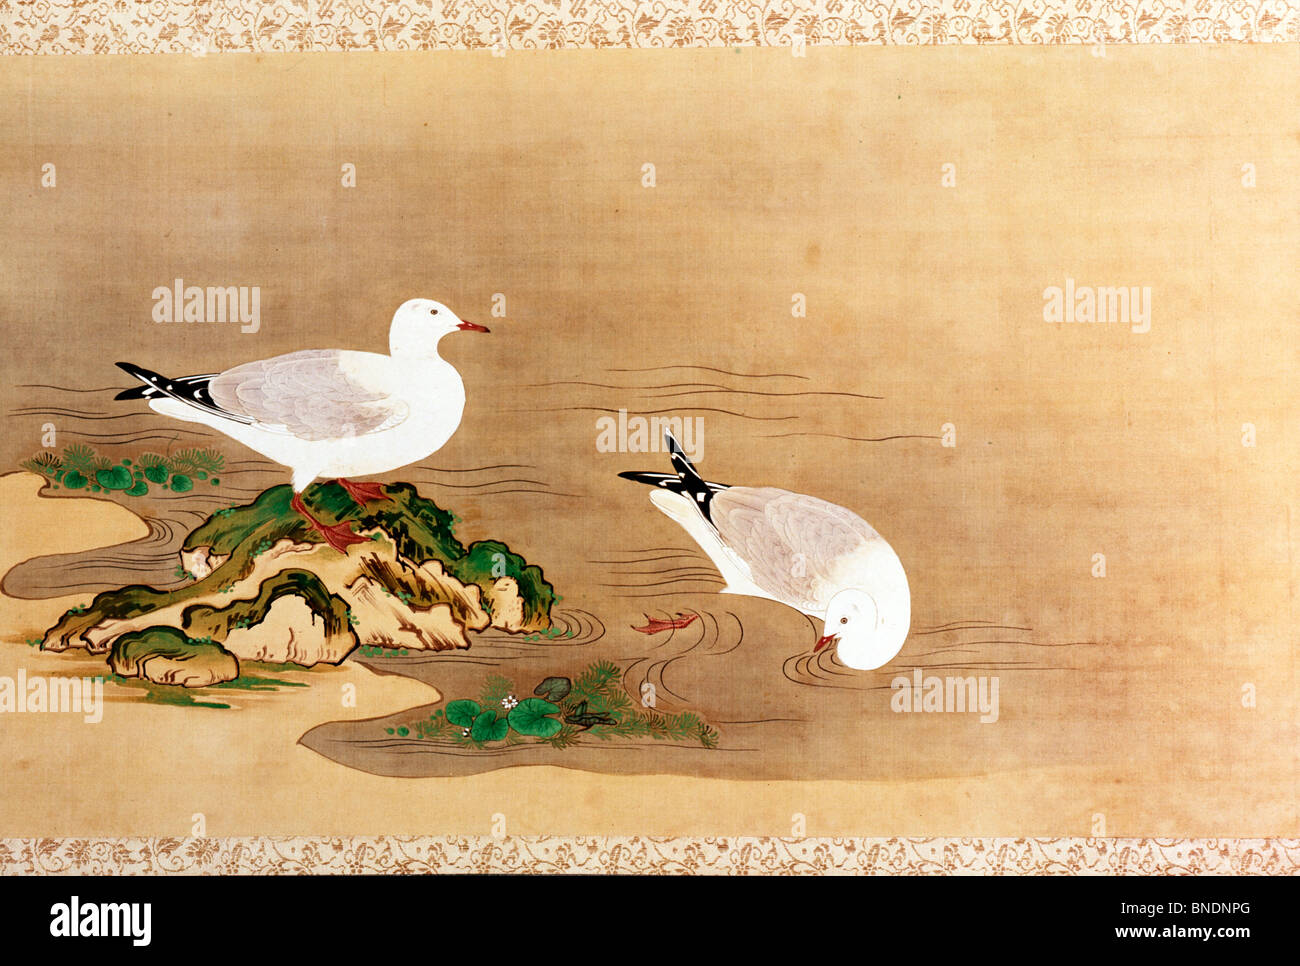 USA, Washington, D.C., Smithsonian Institution, Ducks, Japanese Art, handscroll, - Stock Image